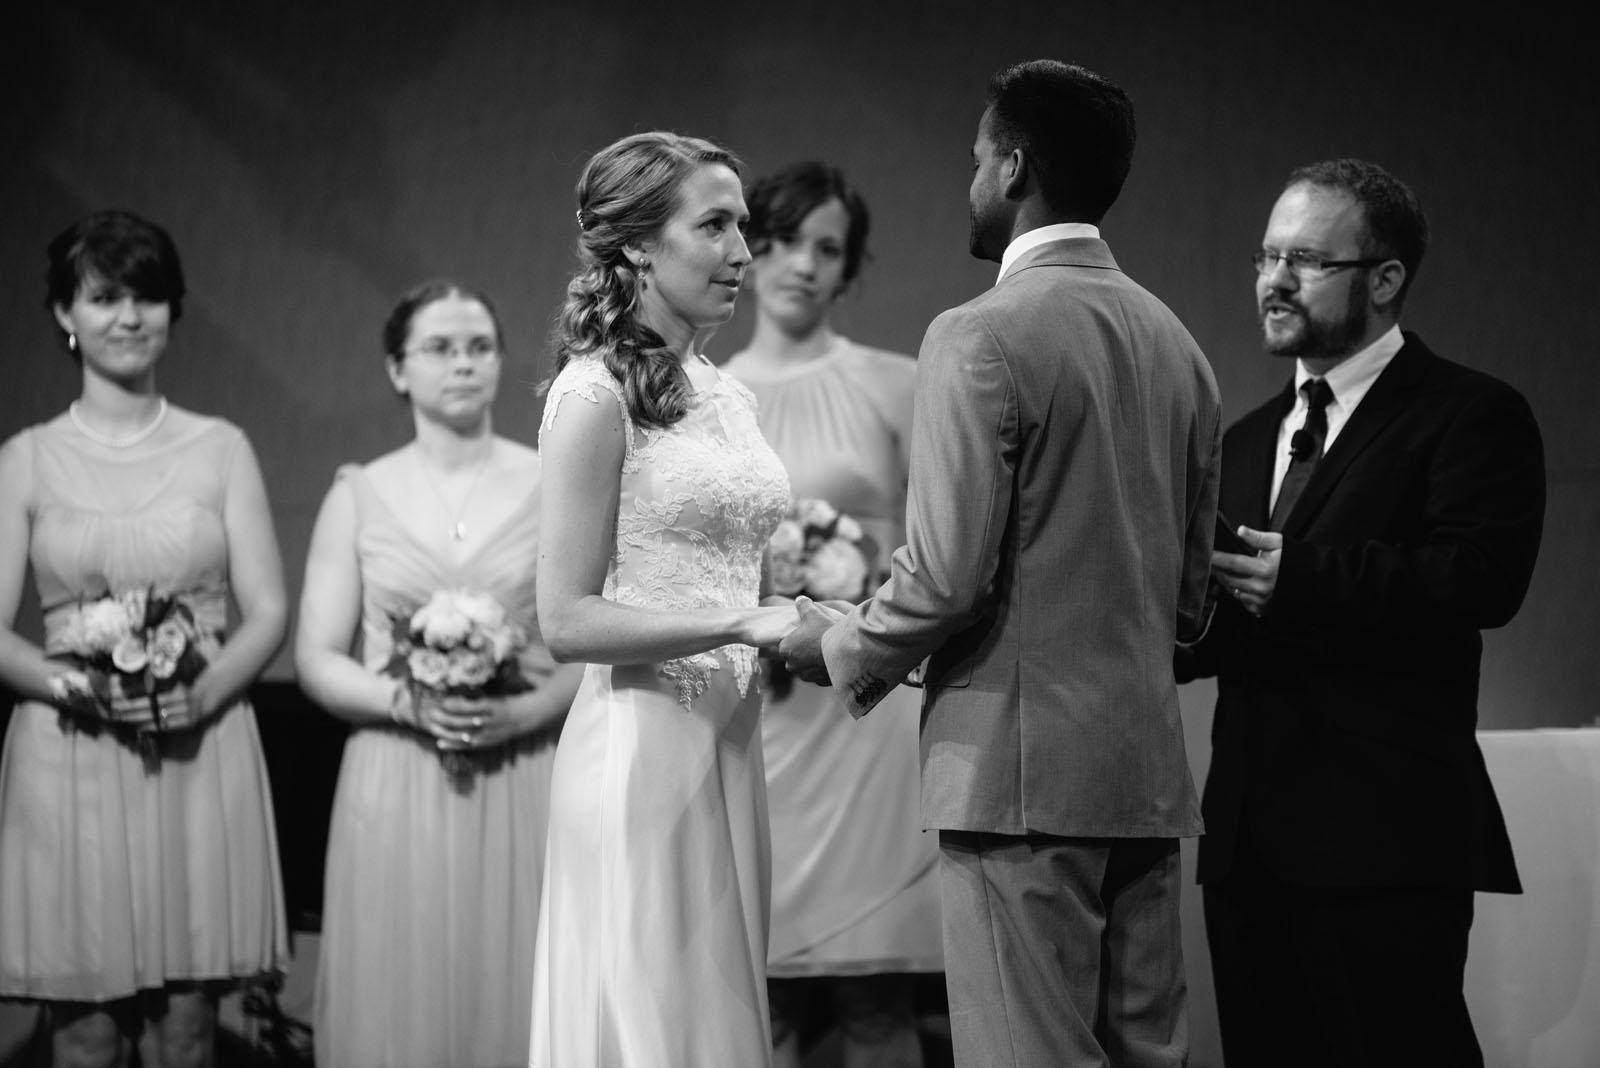 heart-felt-wedding-ceremony-minnesota-photographer.jpg